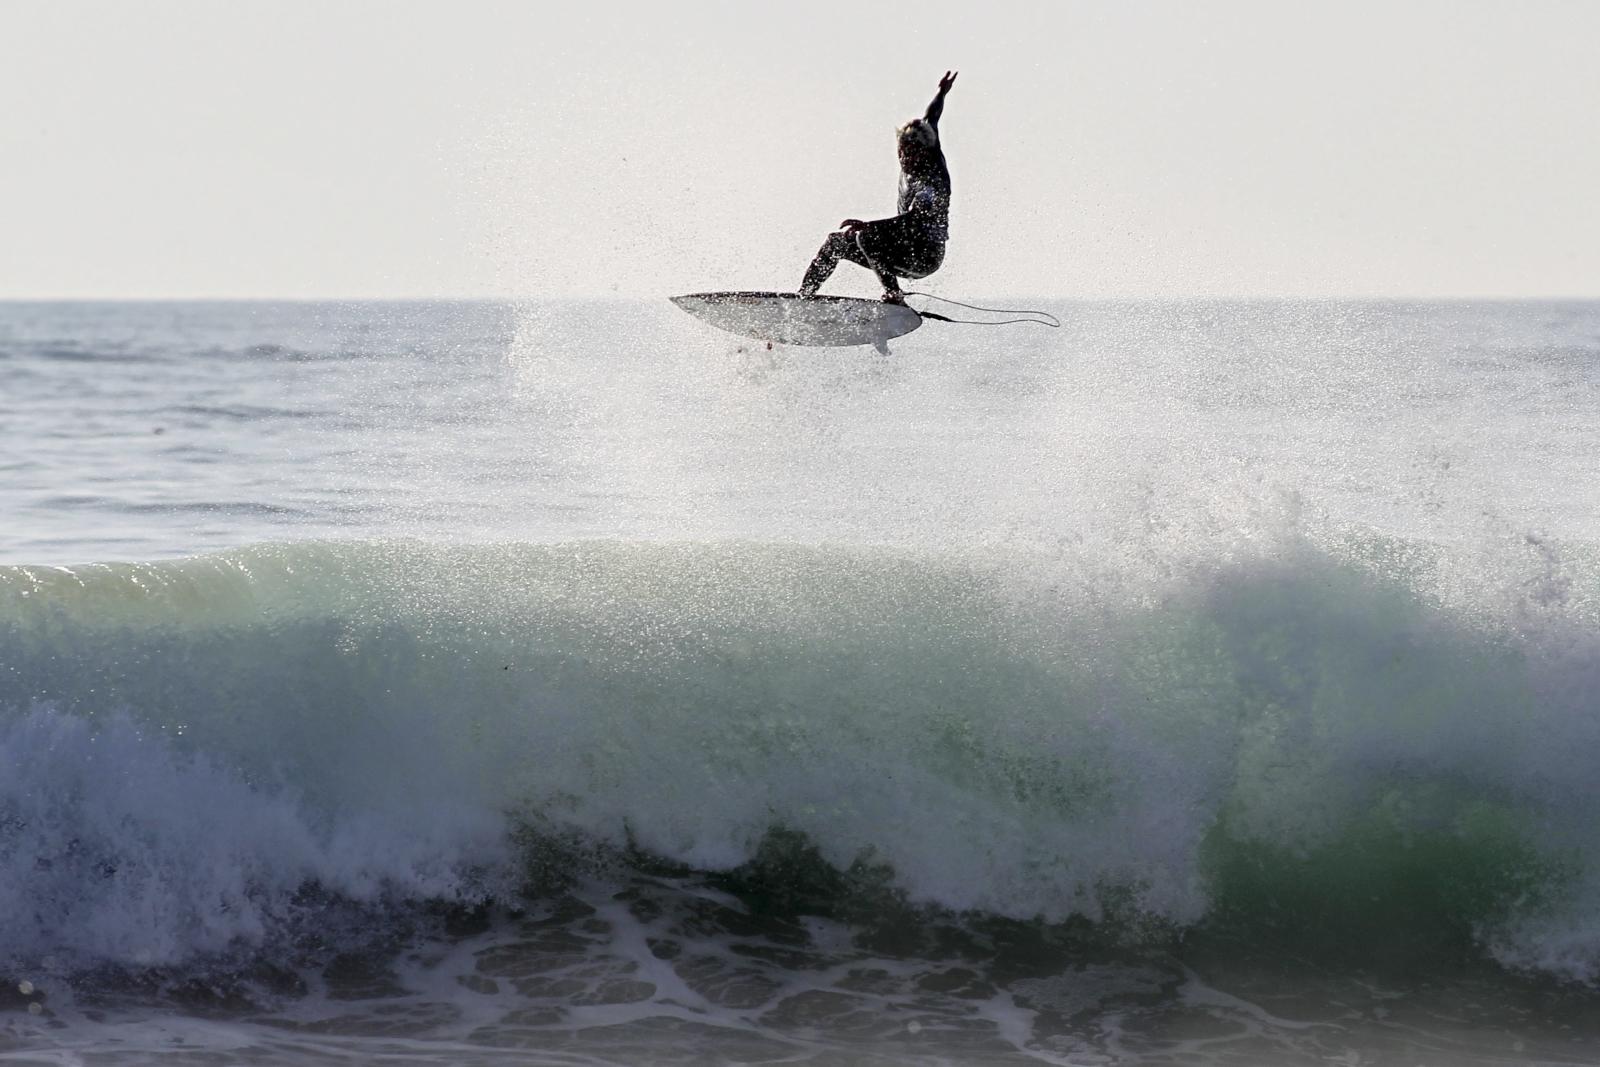 Zawody surfingowe w Portugalii Fot. PAP/EPA/CARLOS BARROSO